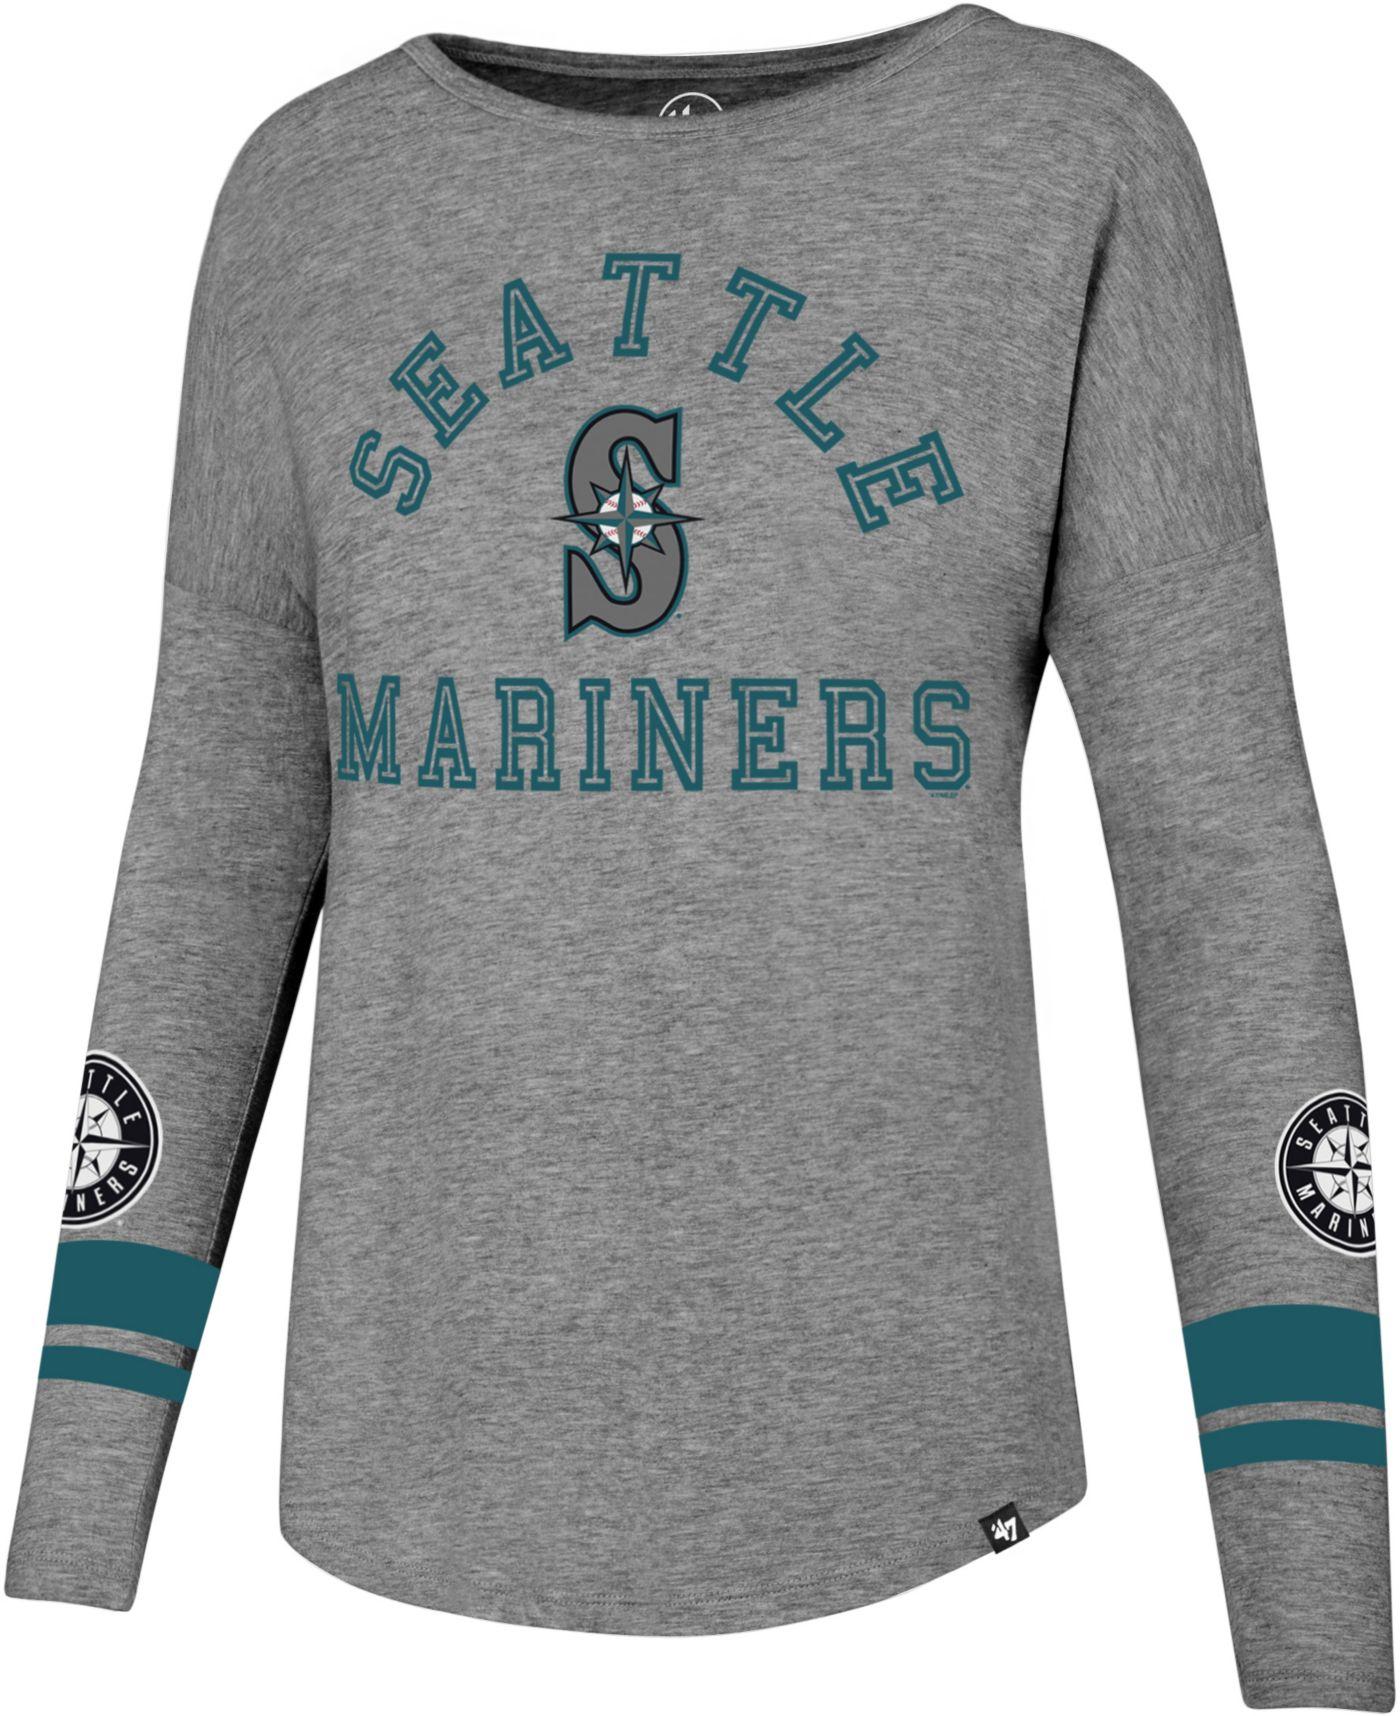 '47 Women's Seattle Mariners Long Sleeve Crew